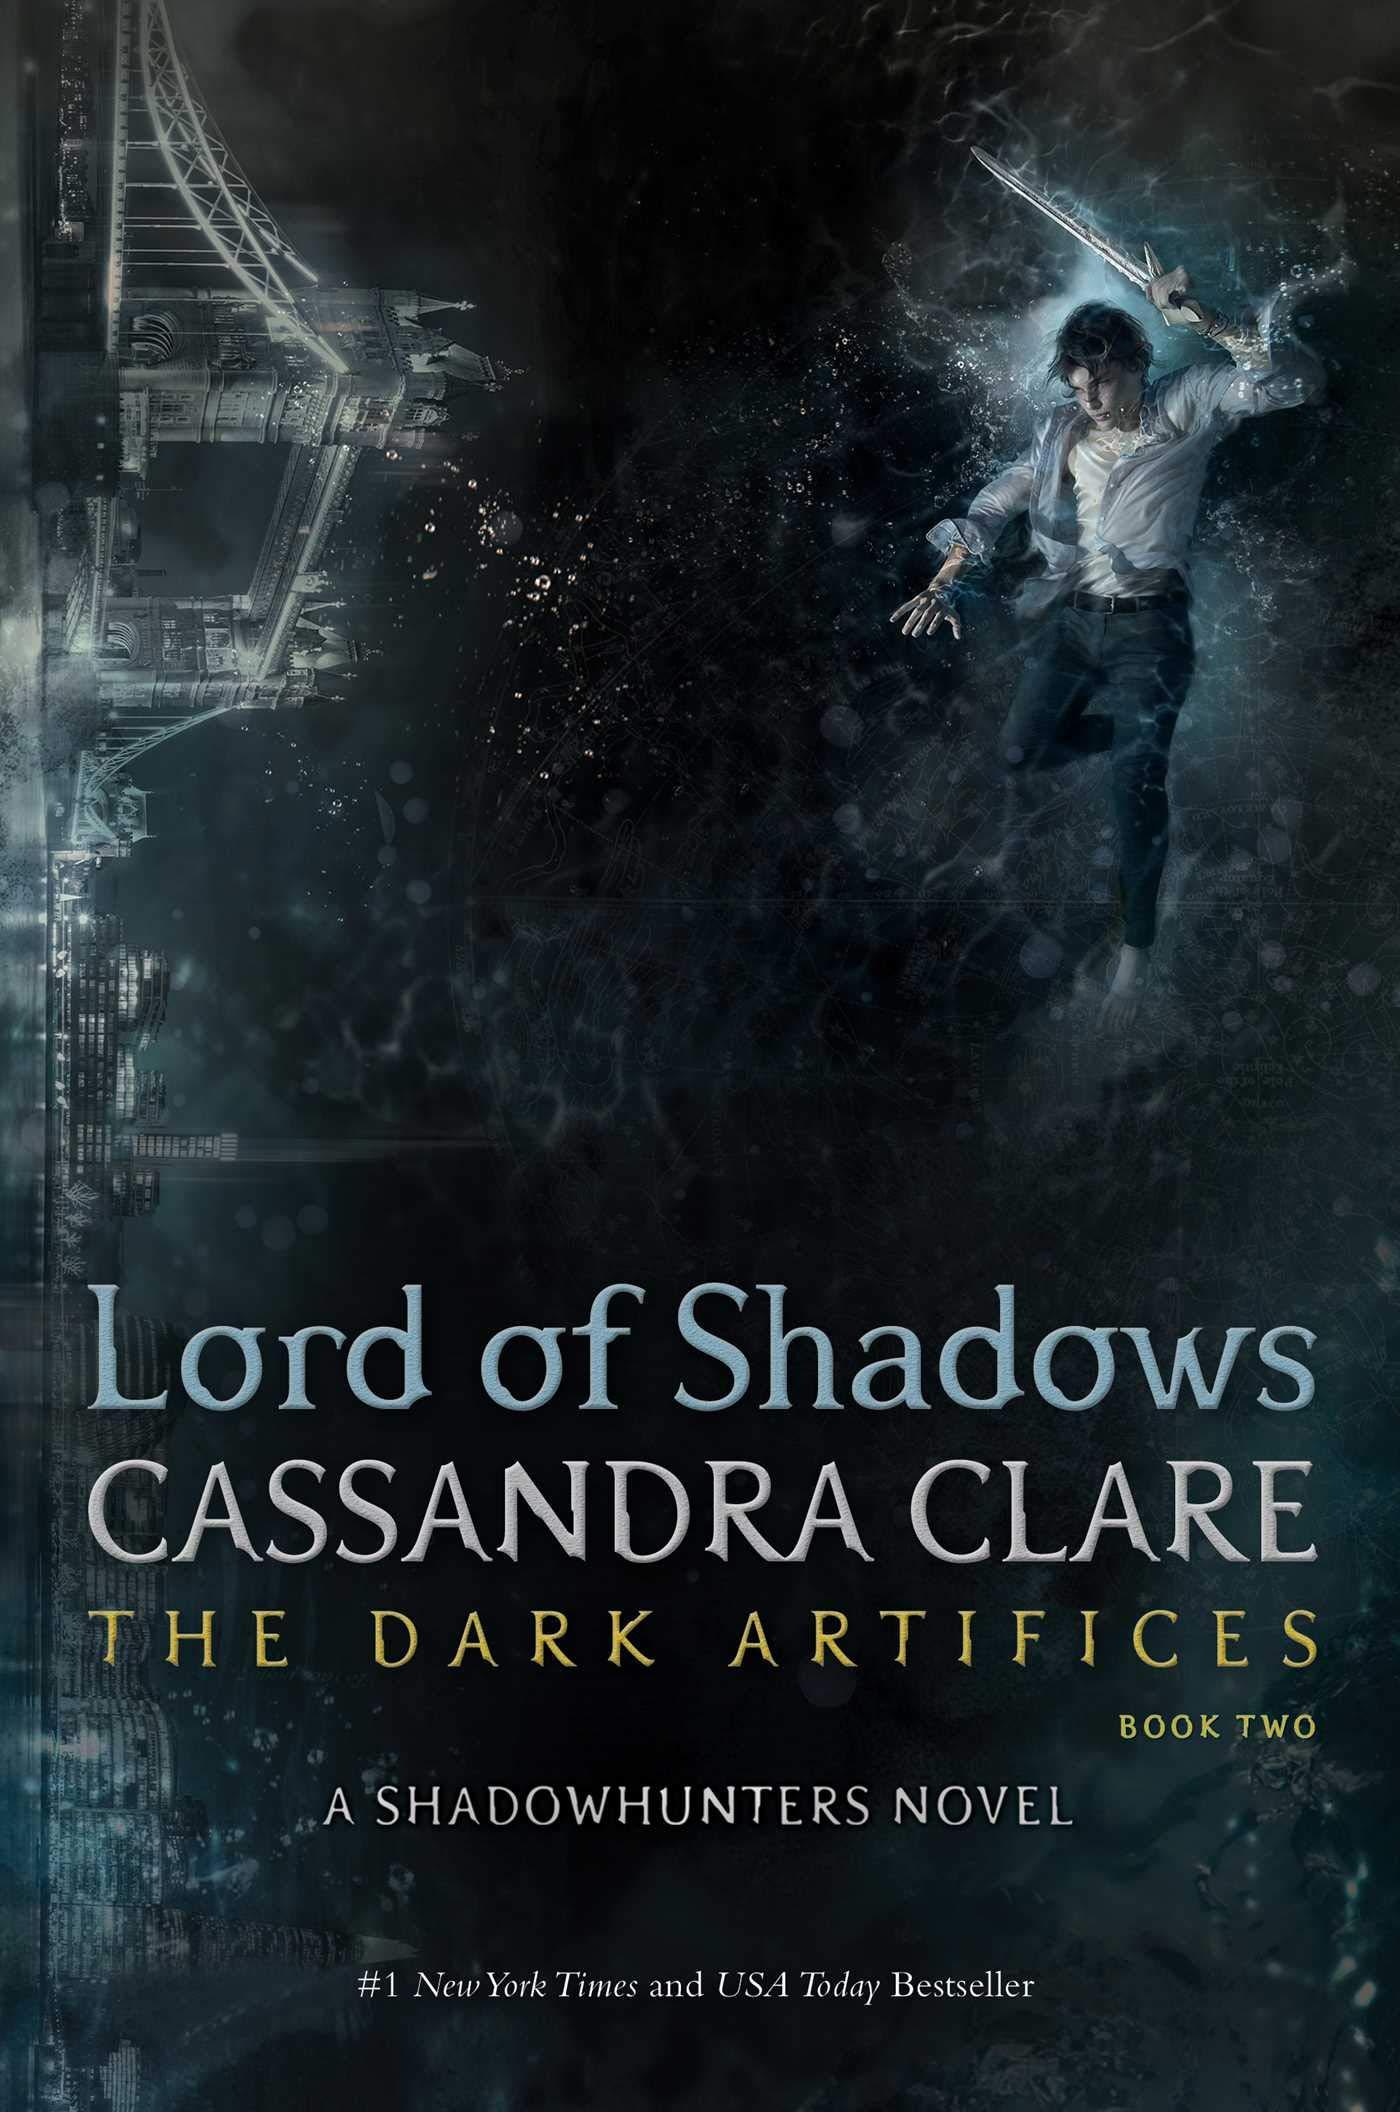 Amazon.com: Lord of Shadows (2) (The Dark Artifices) (9781442468405):  Clare, Cassandra: Books